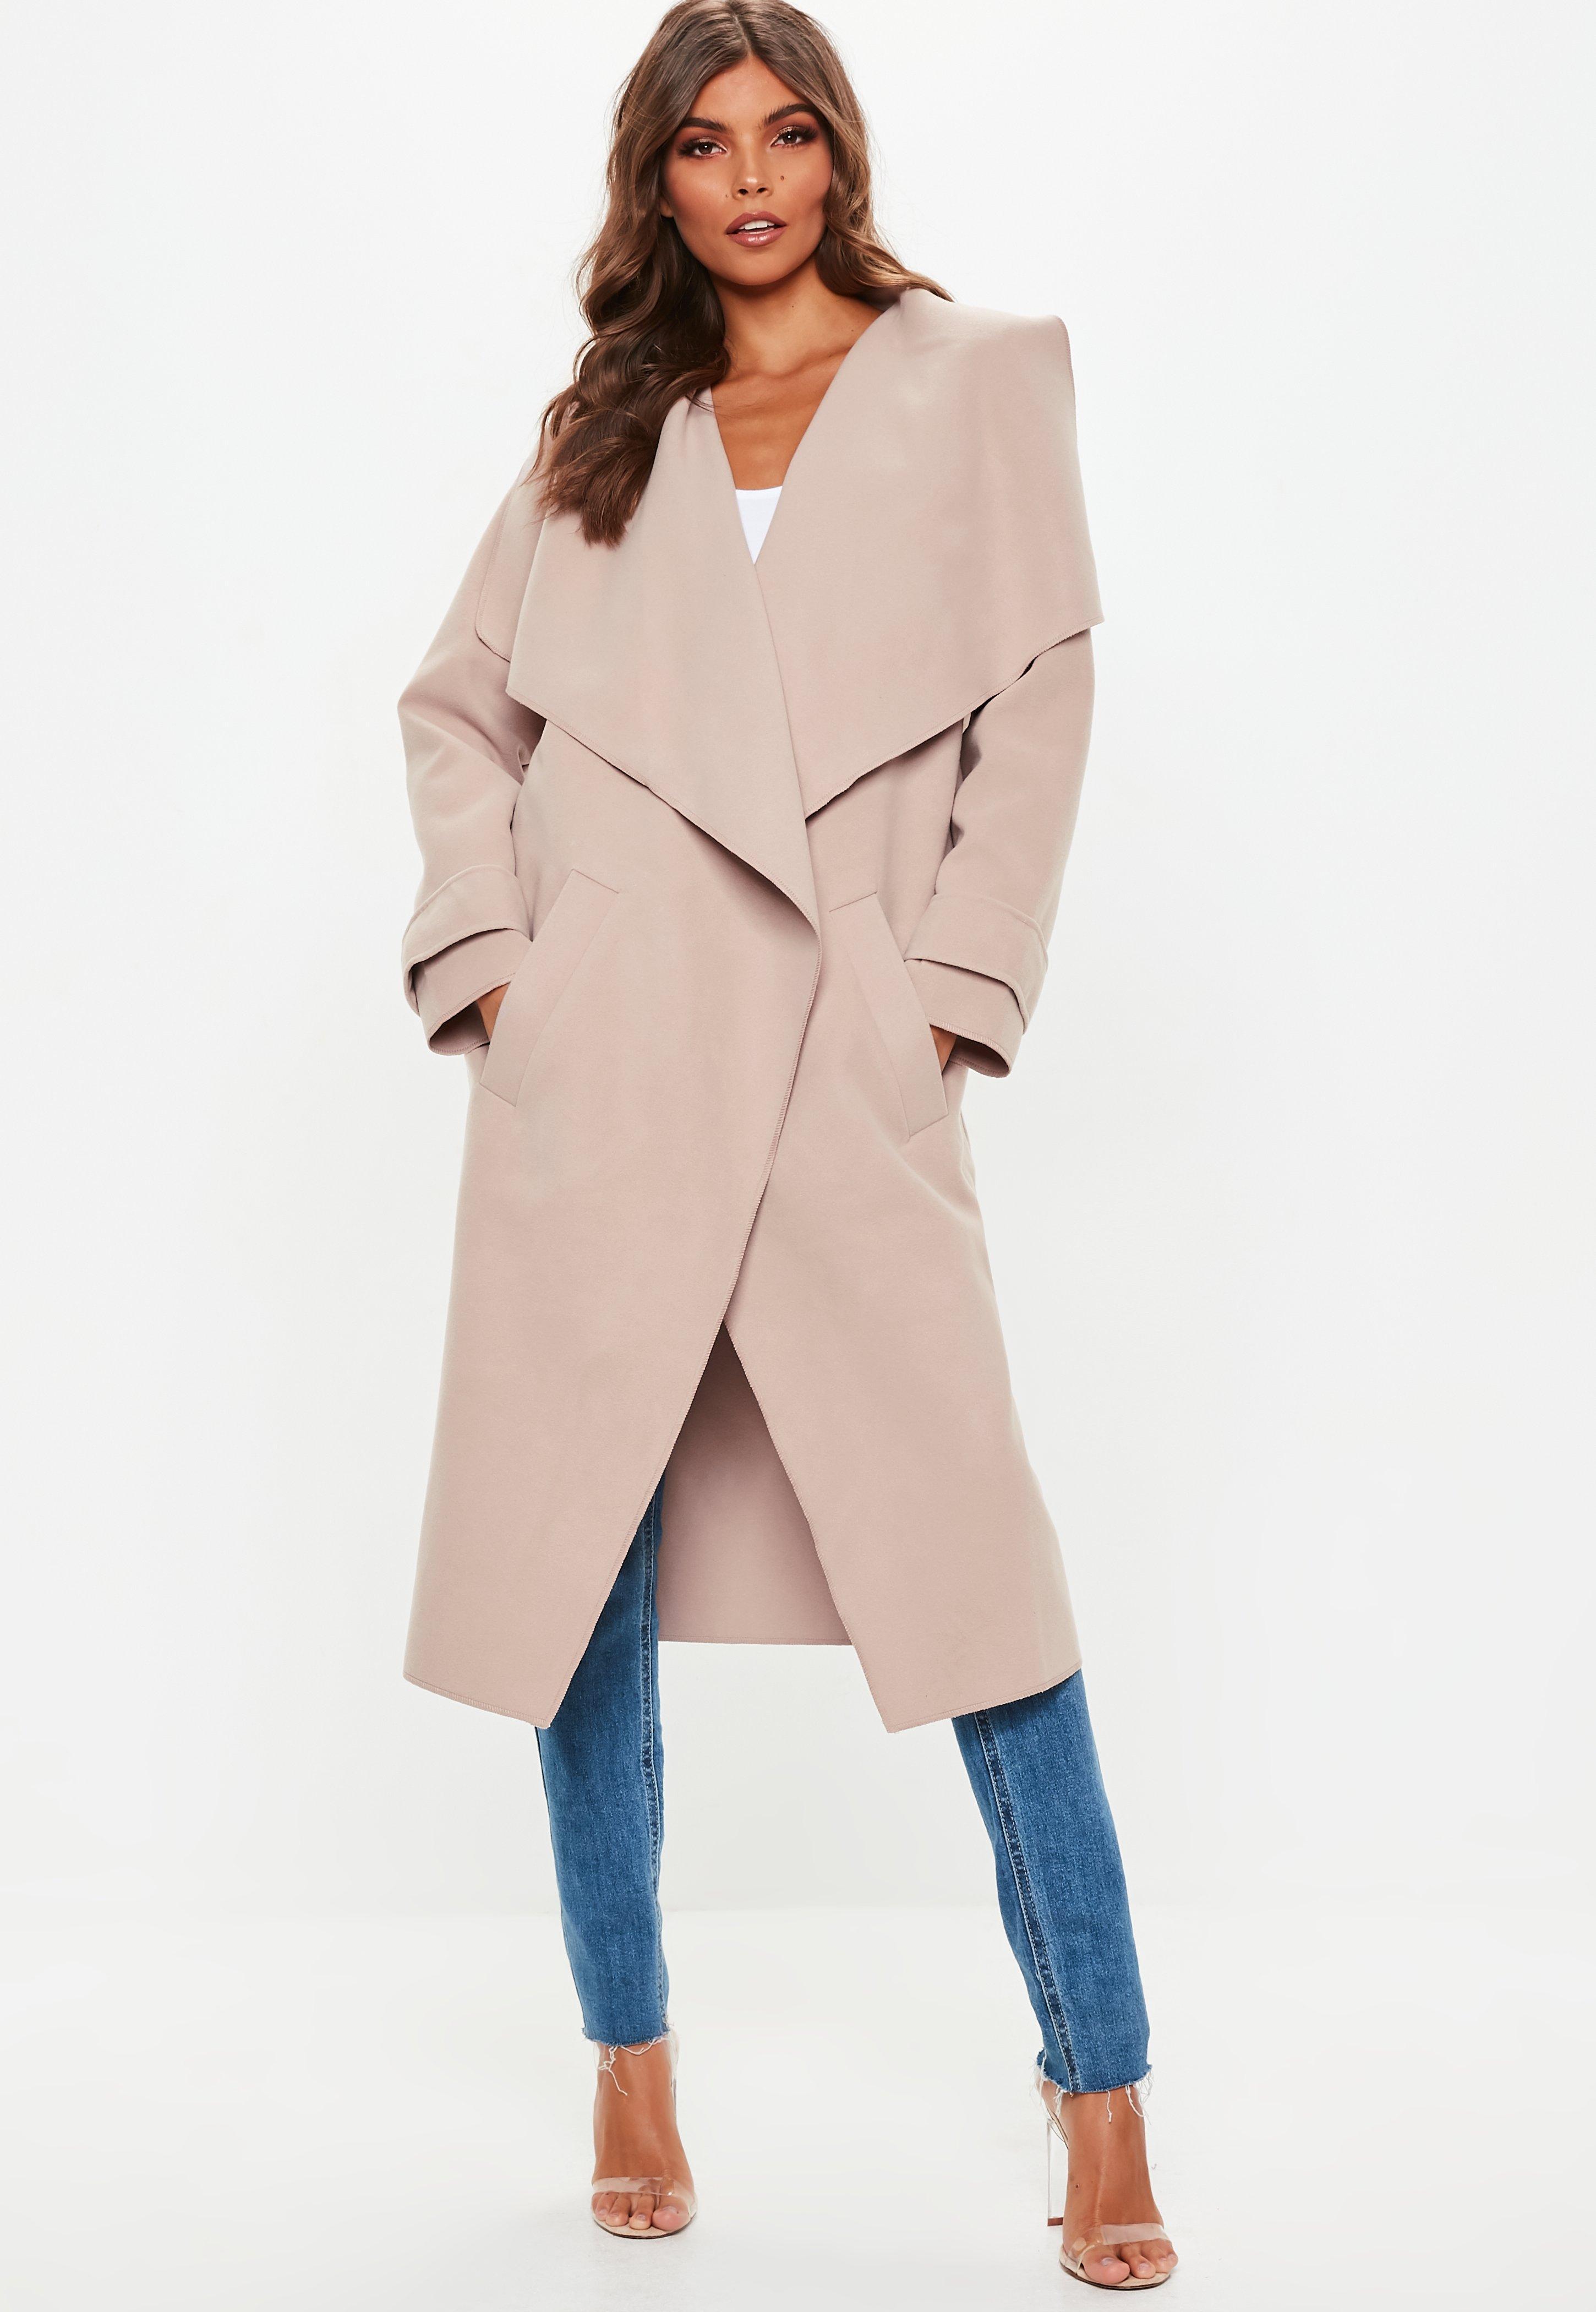 Coats & Jackets | Women's Coats Online UK - Missguided